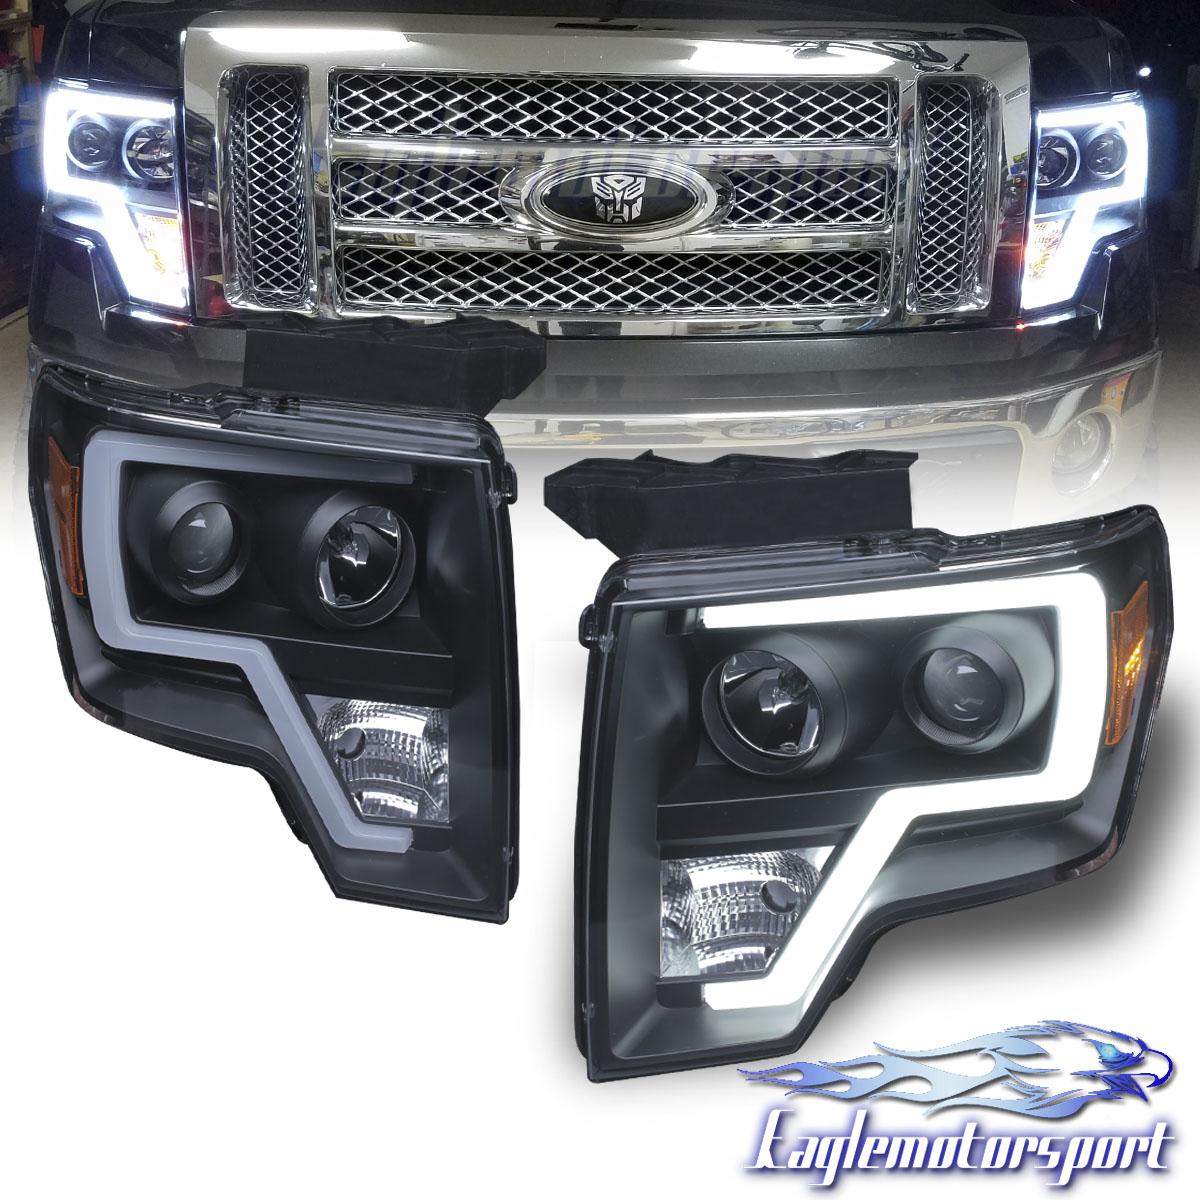 Ford Hid Headlights Wiring Diagram 2009 2014 Ford F 150 Pickup Truck Led Tube Bar Black